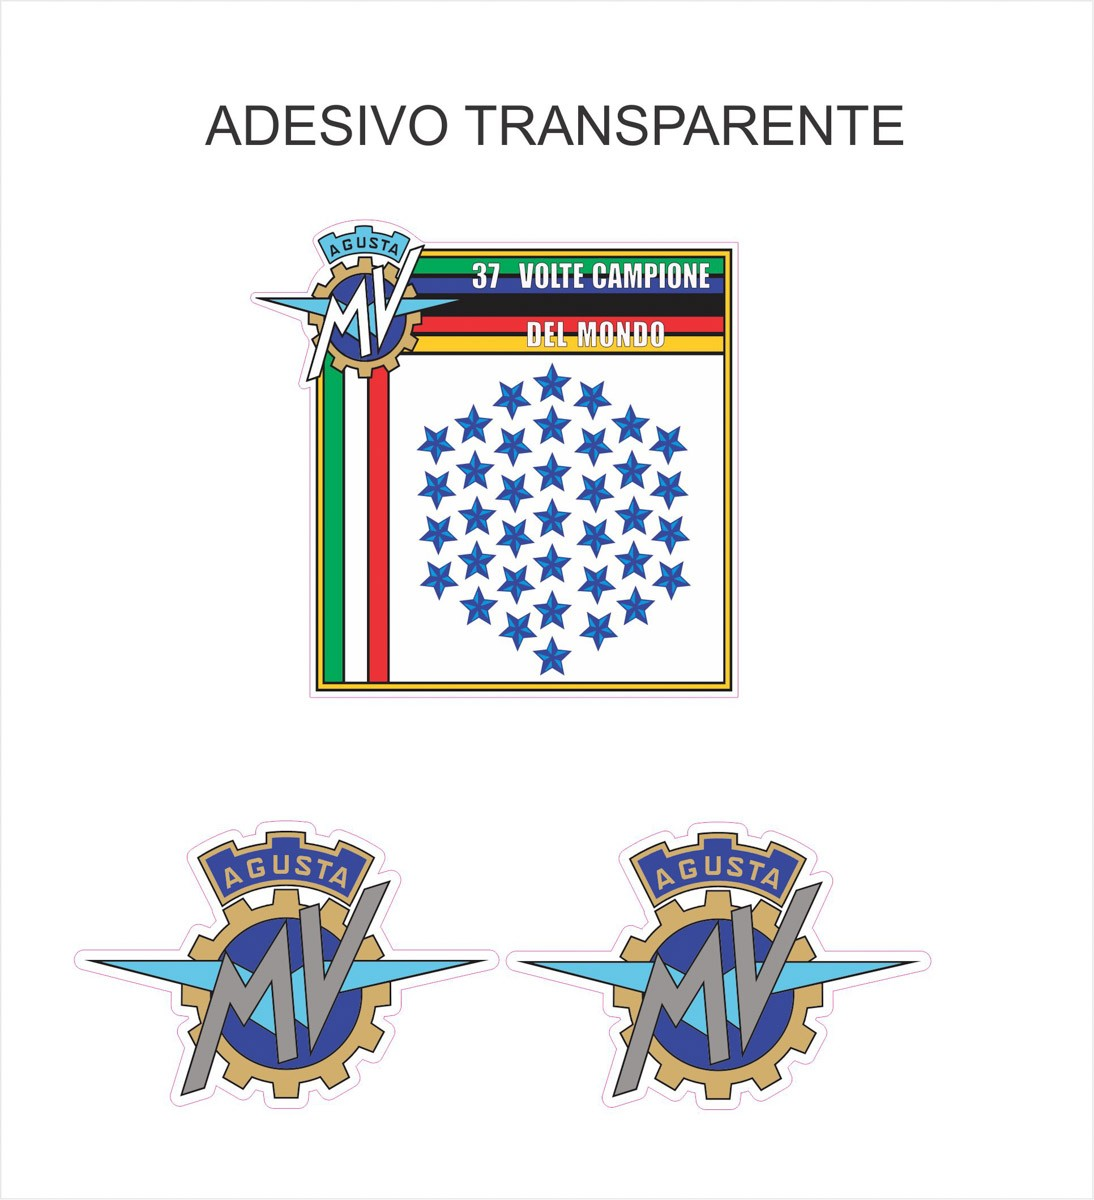 Kit Adesivo Mv Agusta F4 Tanque Vermelho Ag021